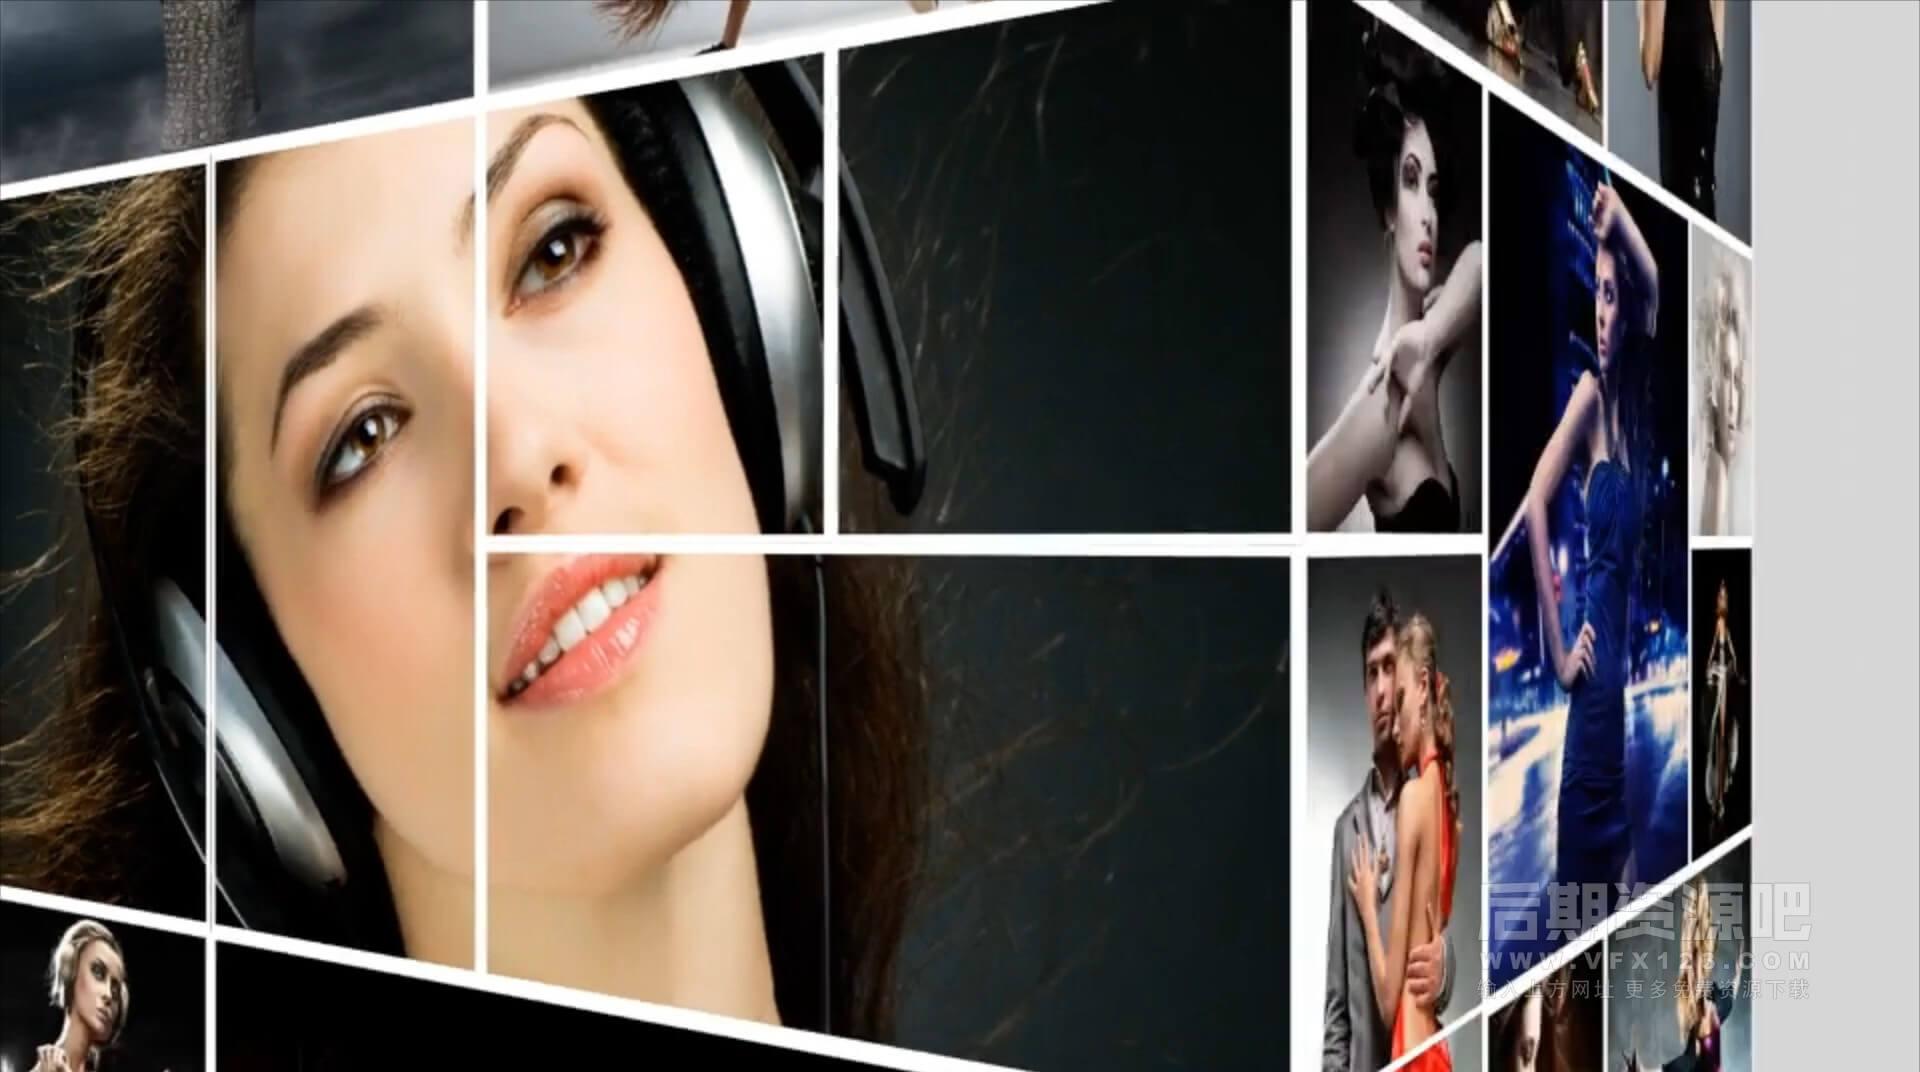 Motion模板 照片拼贴图片墙展示片头效果 Simple Slideshow Tower Promo